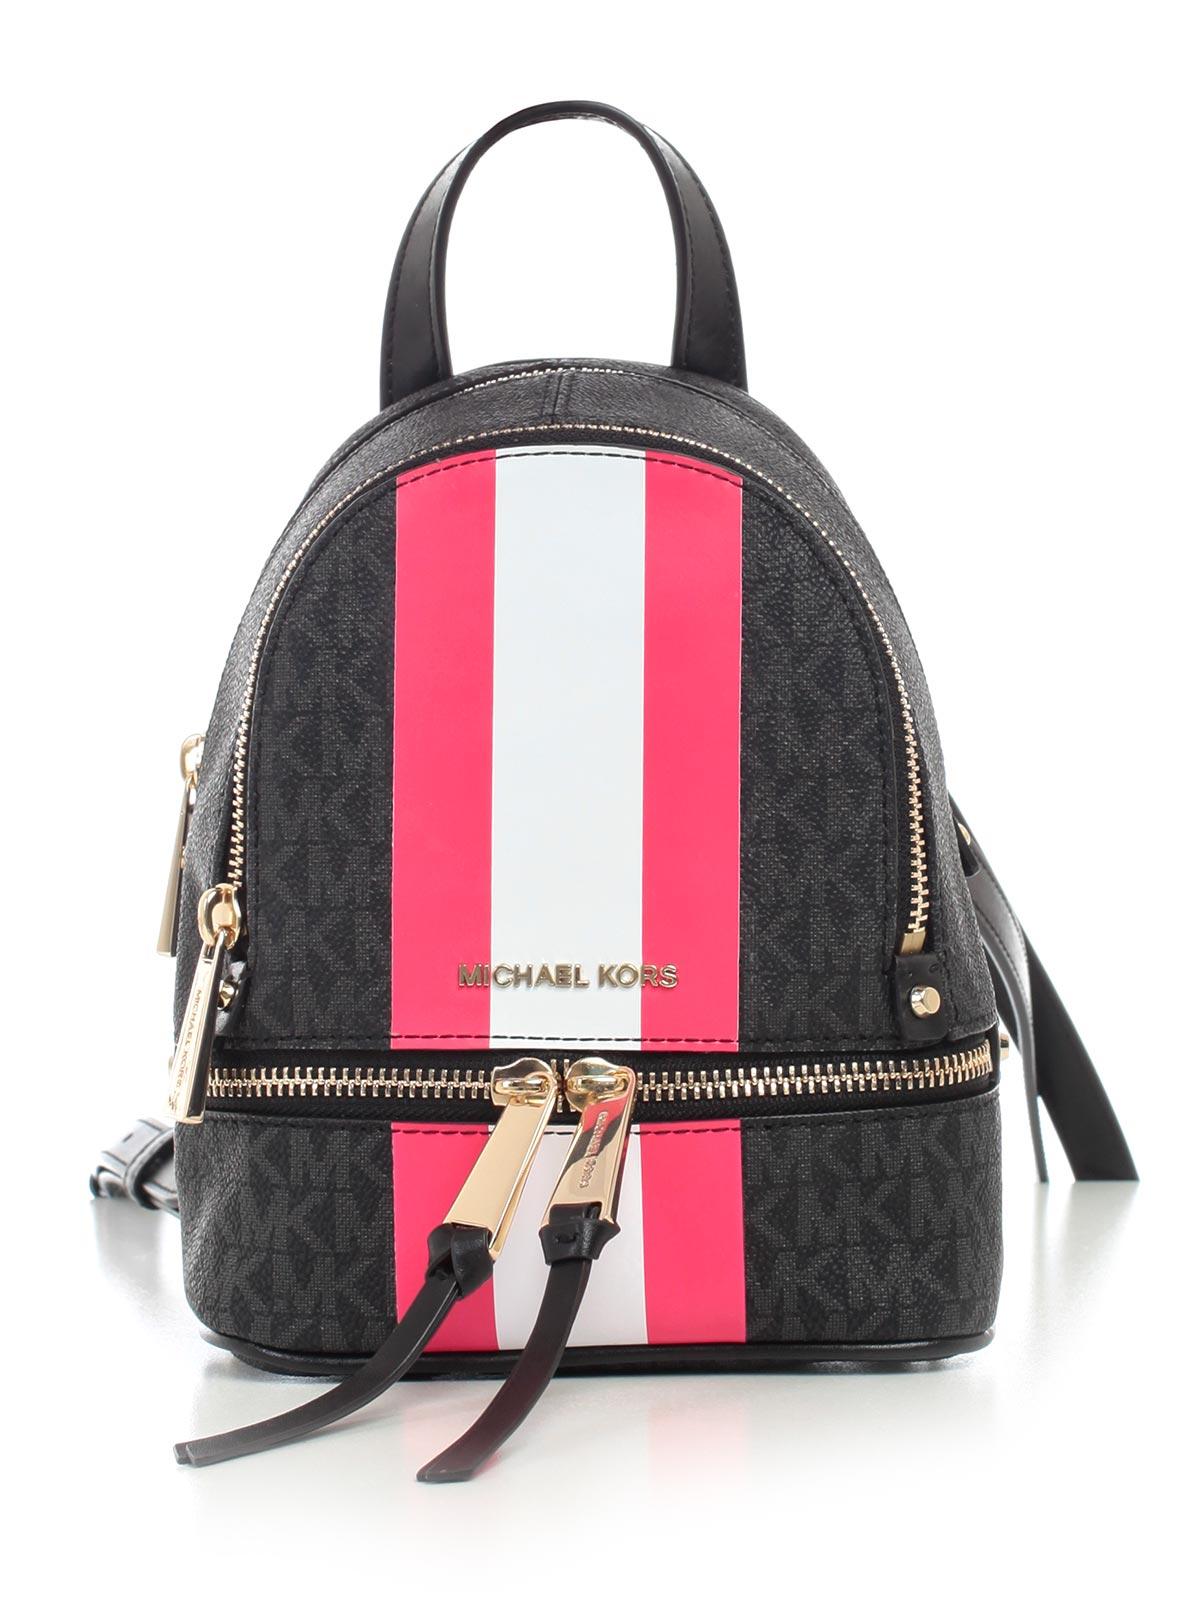 Michael Kors Bags 30t9lezb1b